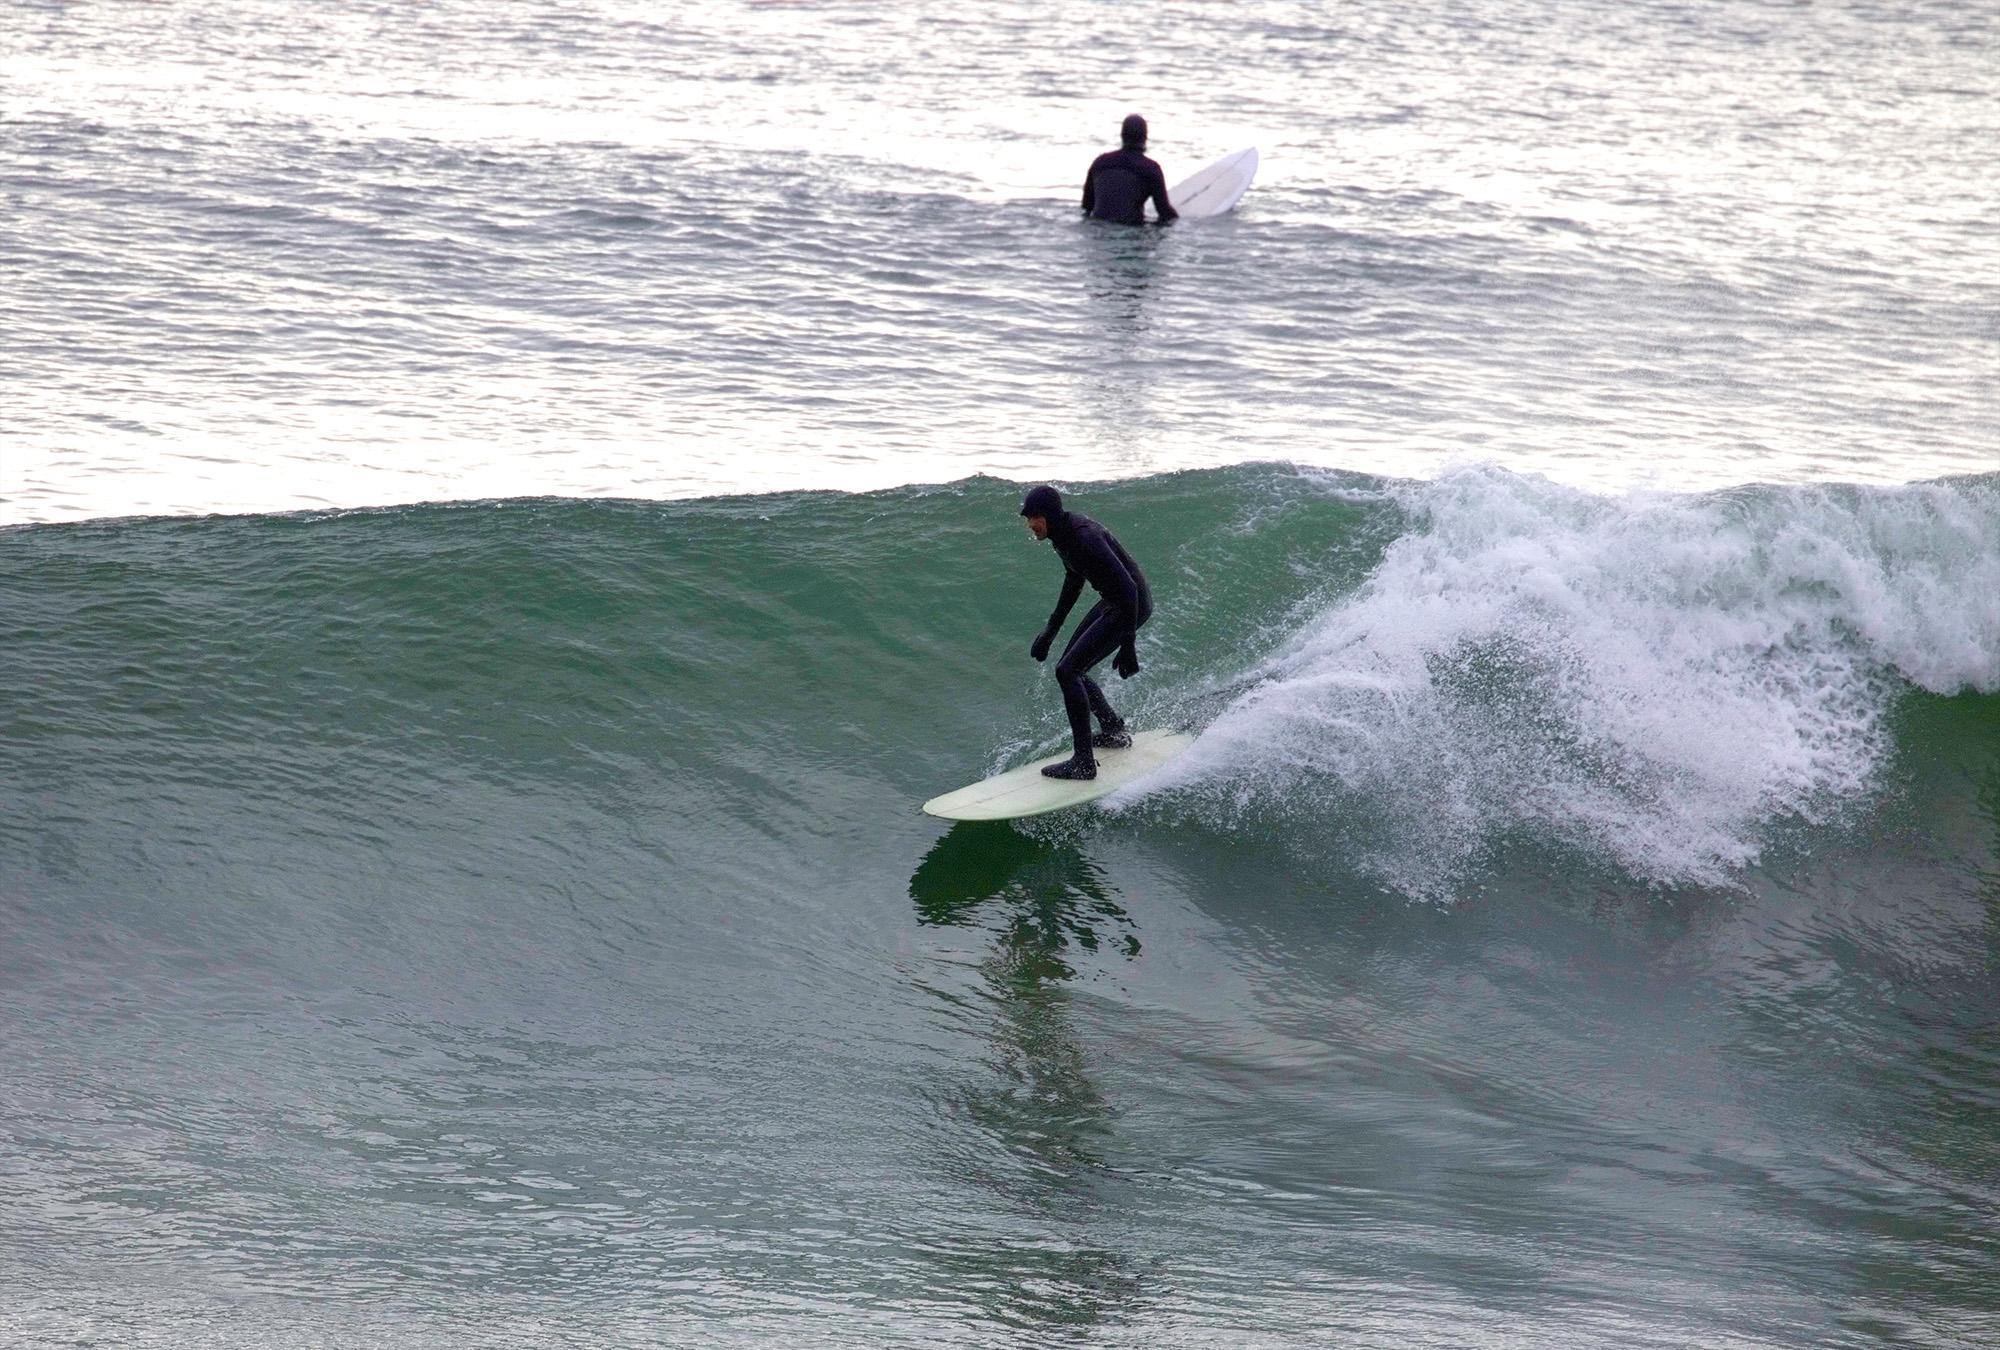 1-19-17 MTK Surfer 5.jpg